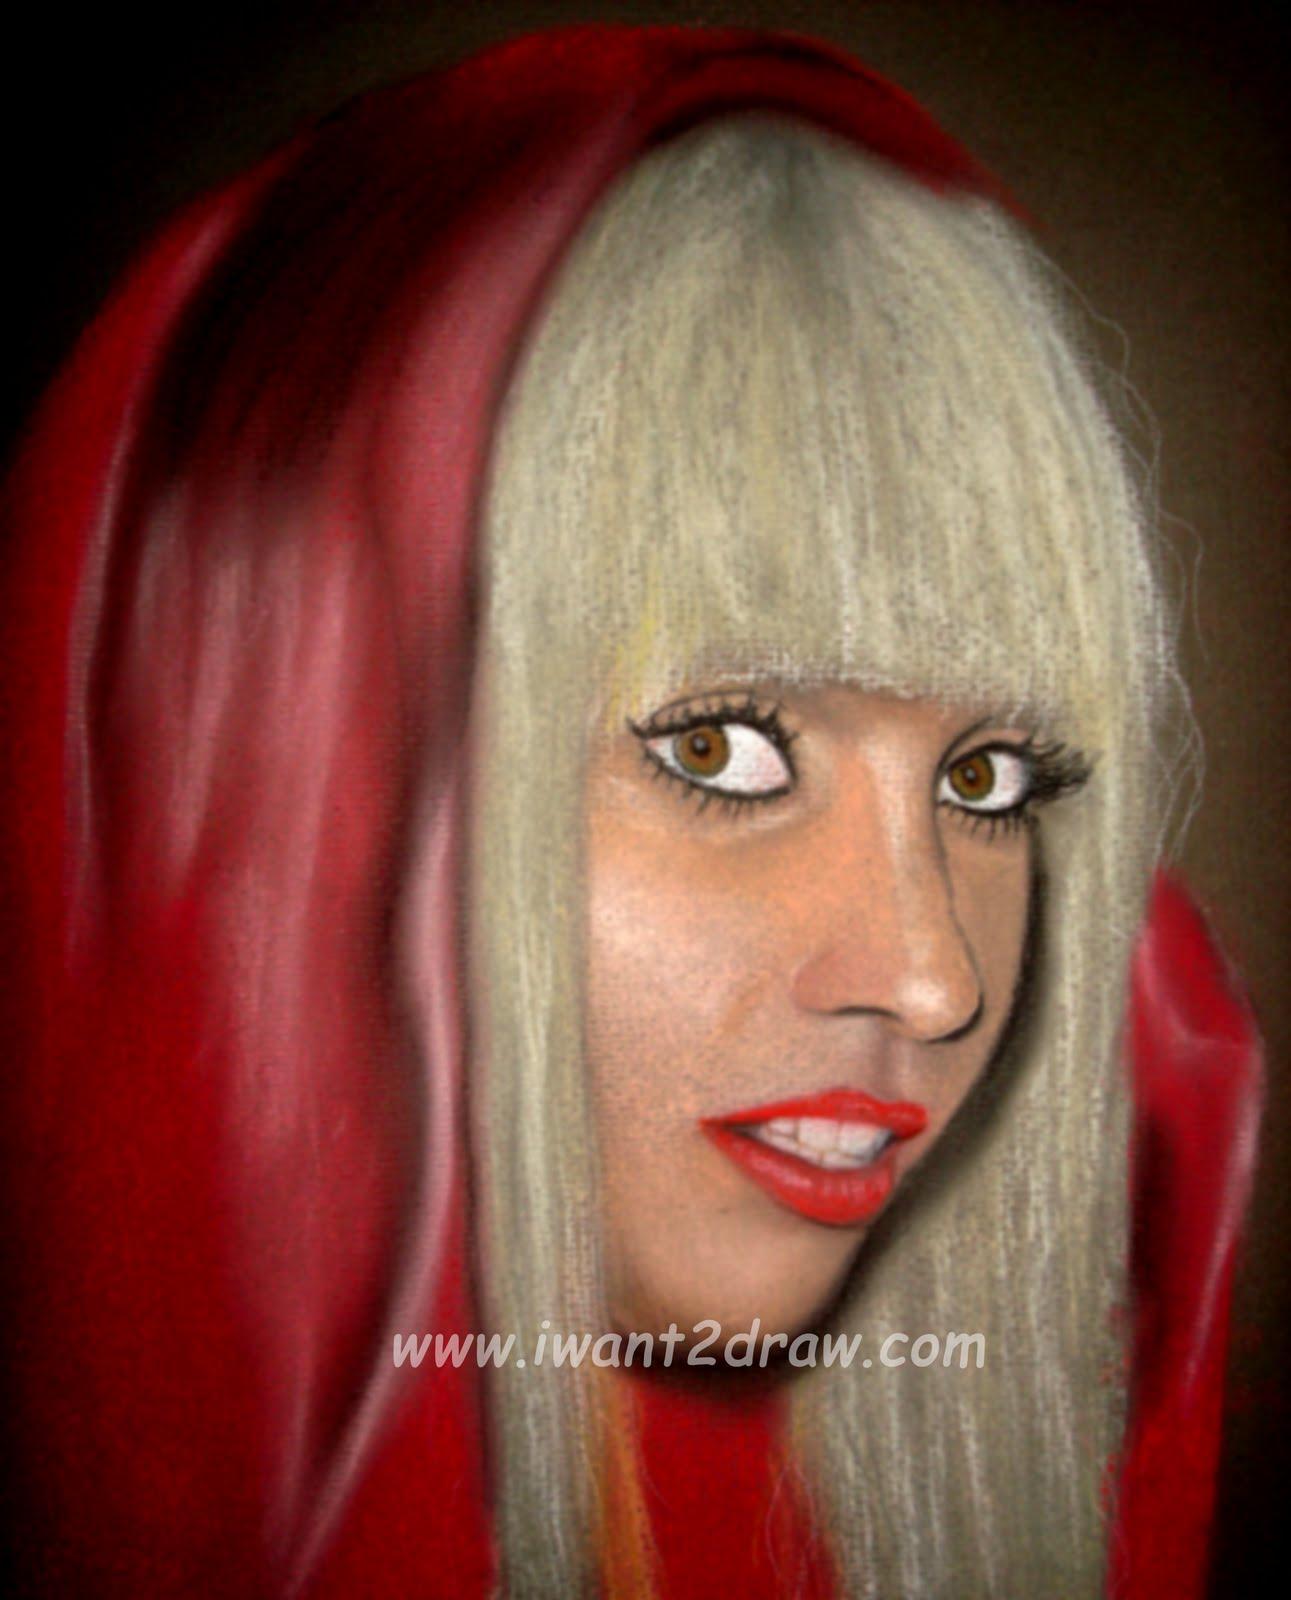 http://4.bp.blogspot.com/-K8O8DerzNb4/TfkjEoYDRXI/AAAAAAAAAnI/rfb-weJ-gNg/s1600/Little+Monster+Lady+Gaga.jpg